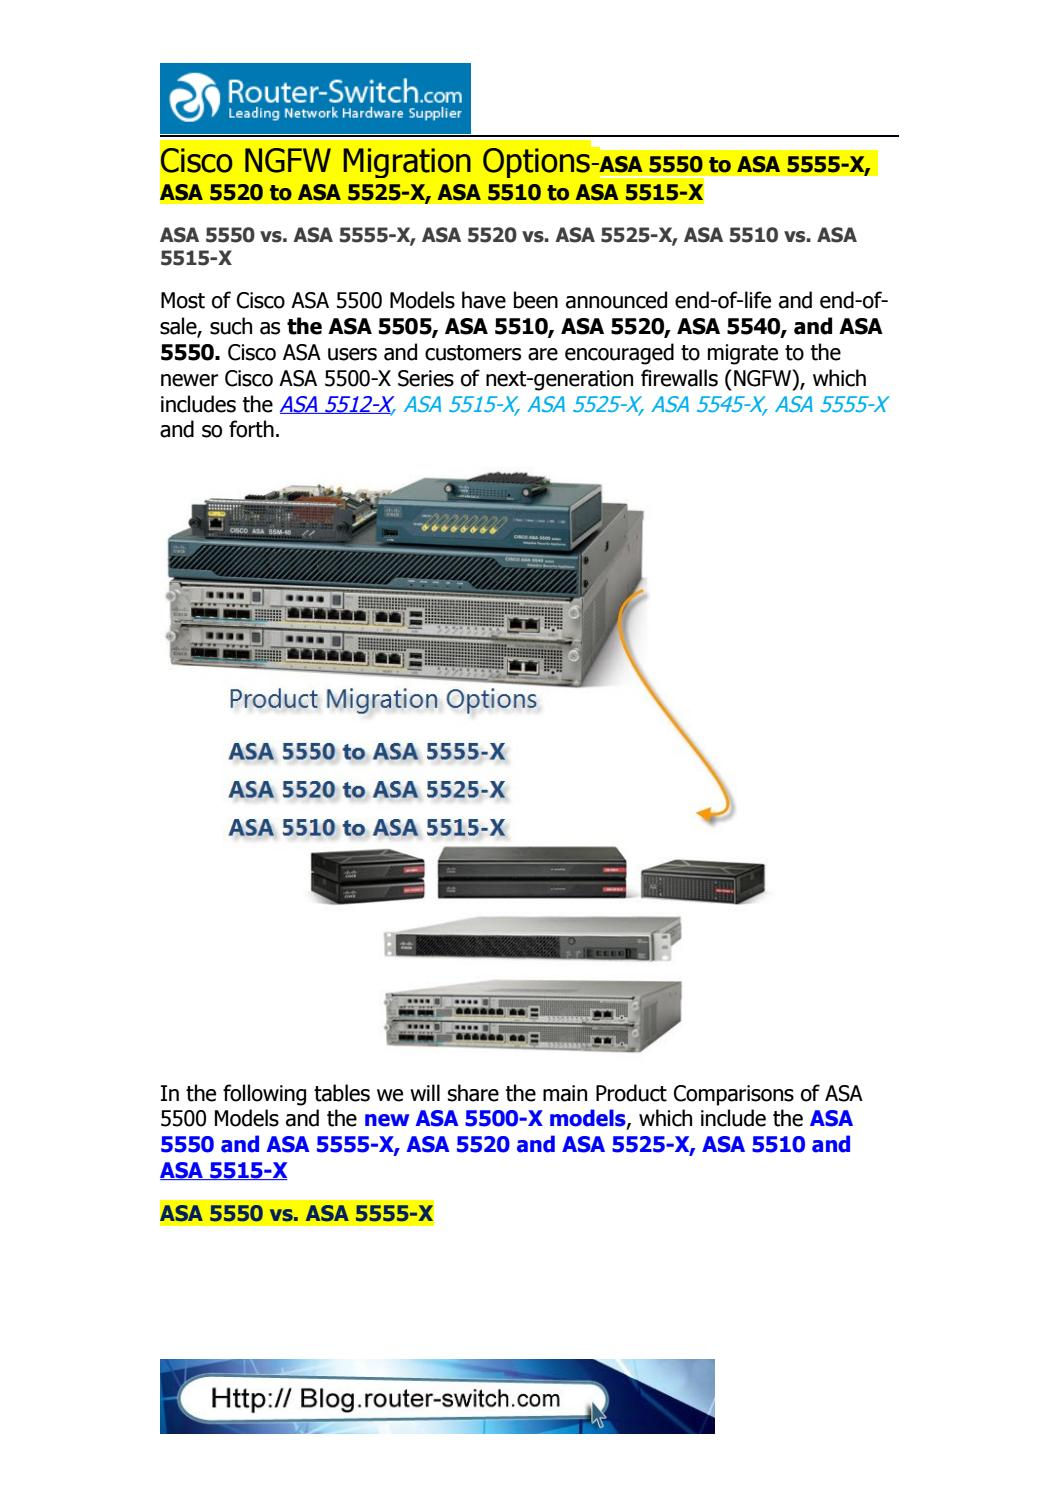 Cisco asa 5500 x series migration options asa 5555 x, asa